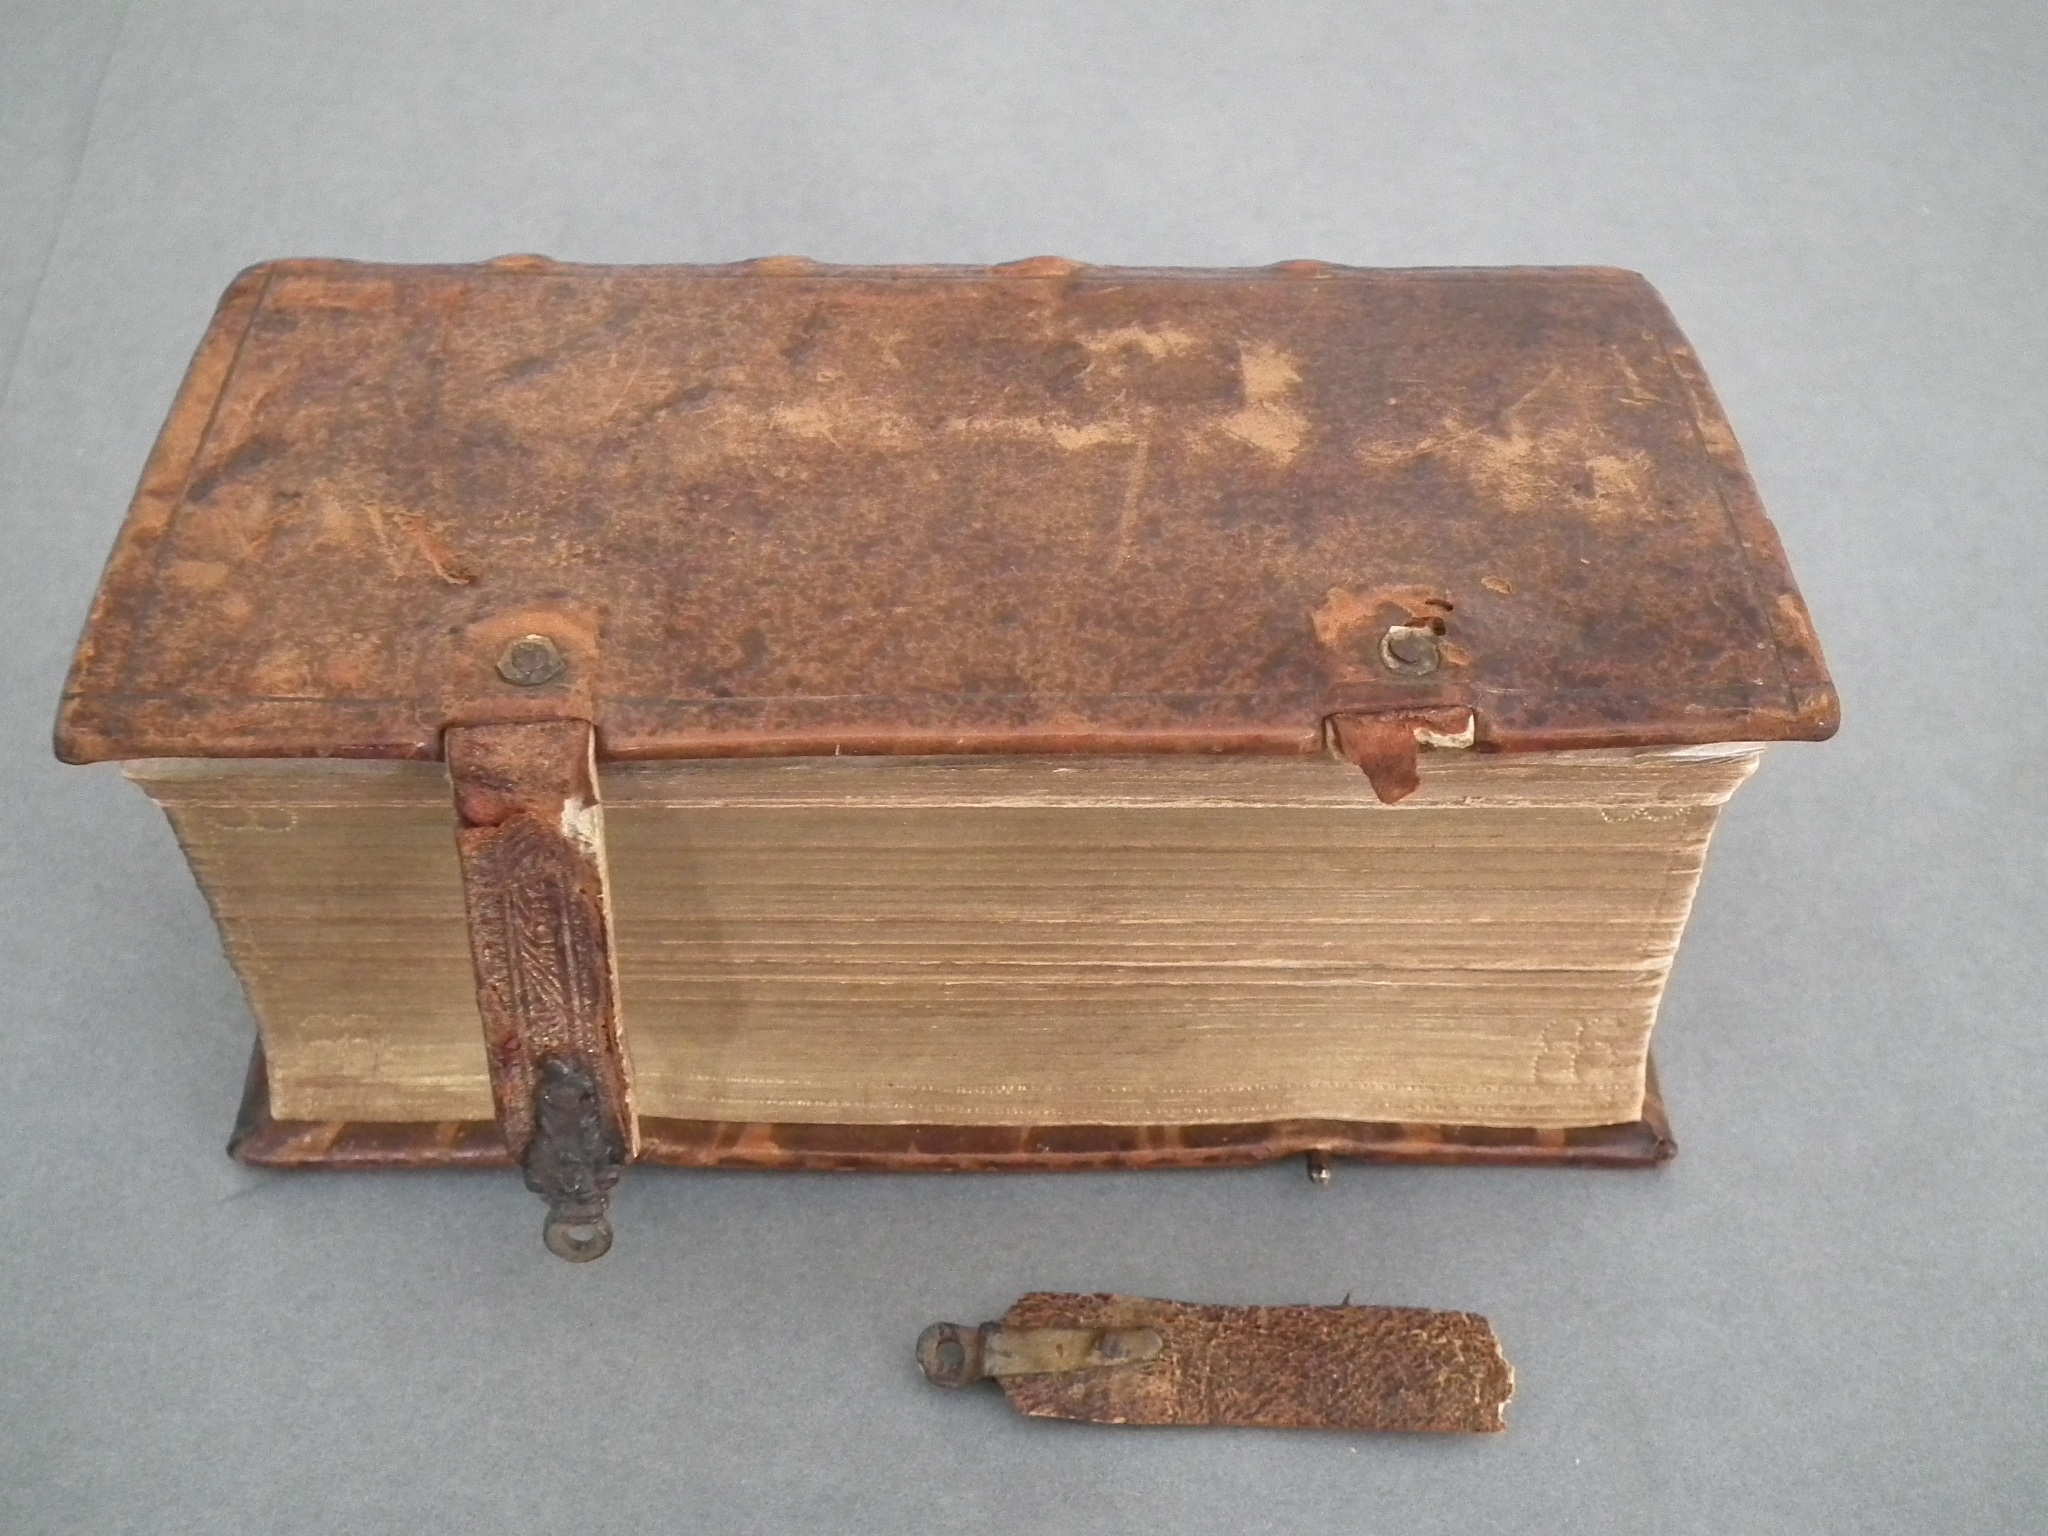 Praxis pietatis melica, Johann Cruger 1688. Vorzustand.